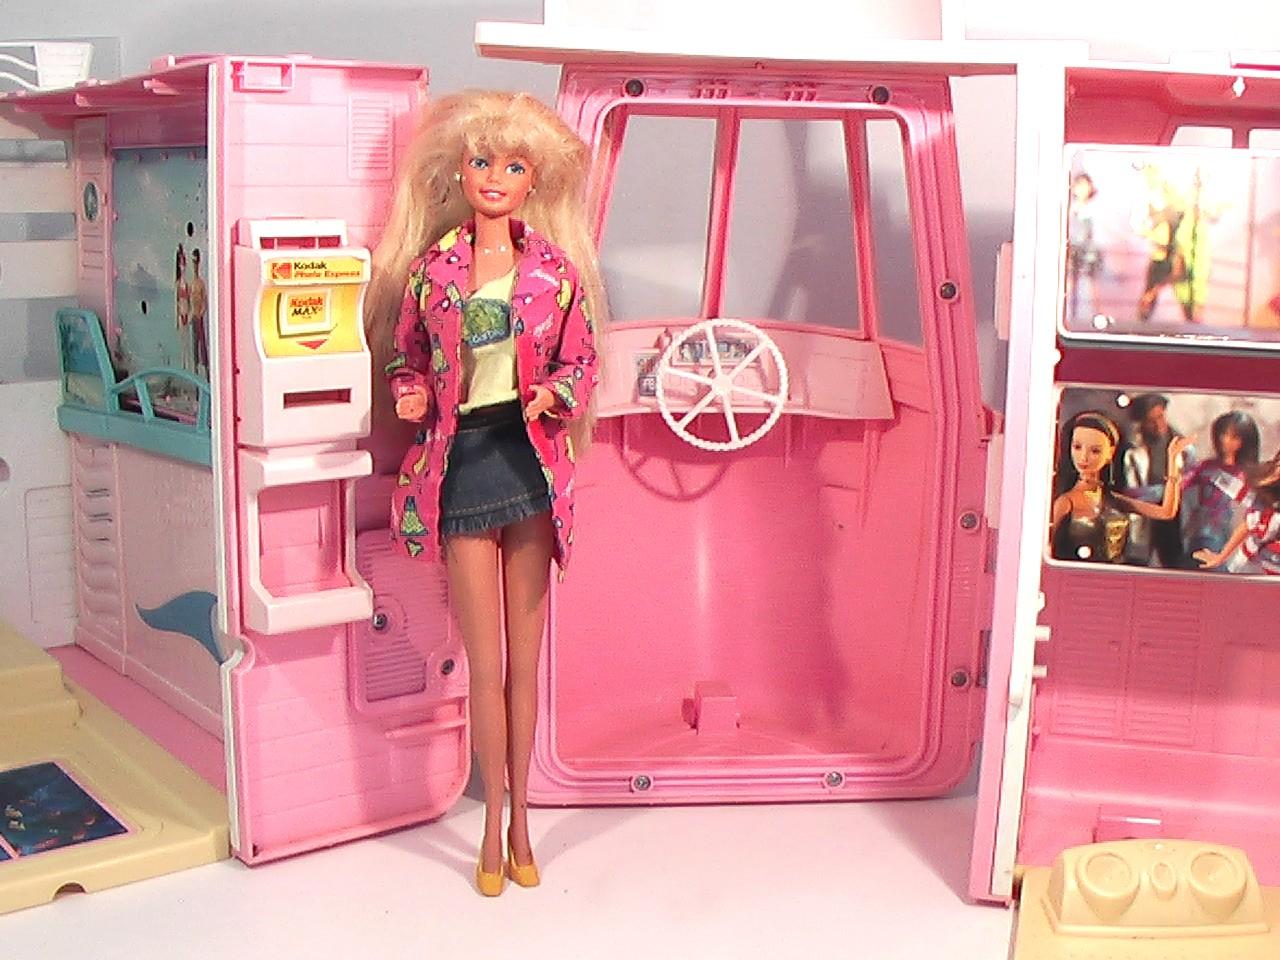 Barbie Brinquedo Antigo Mattel Jogo Puzzle 100 Pecas 90/00 - R$ 40 ...